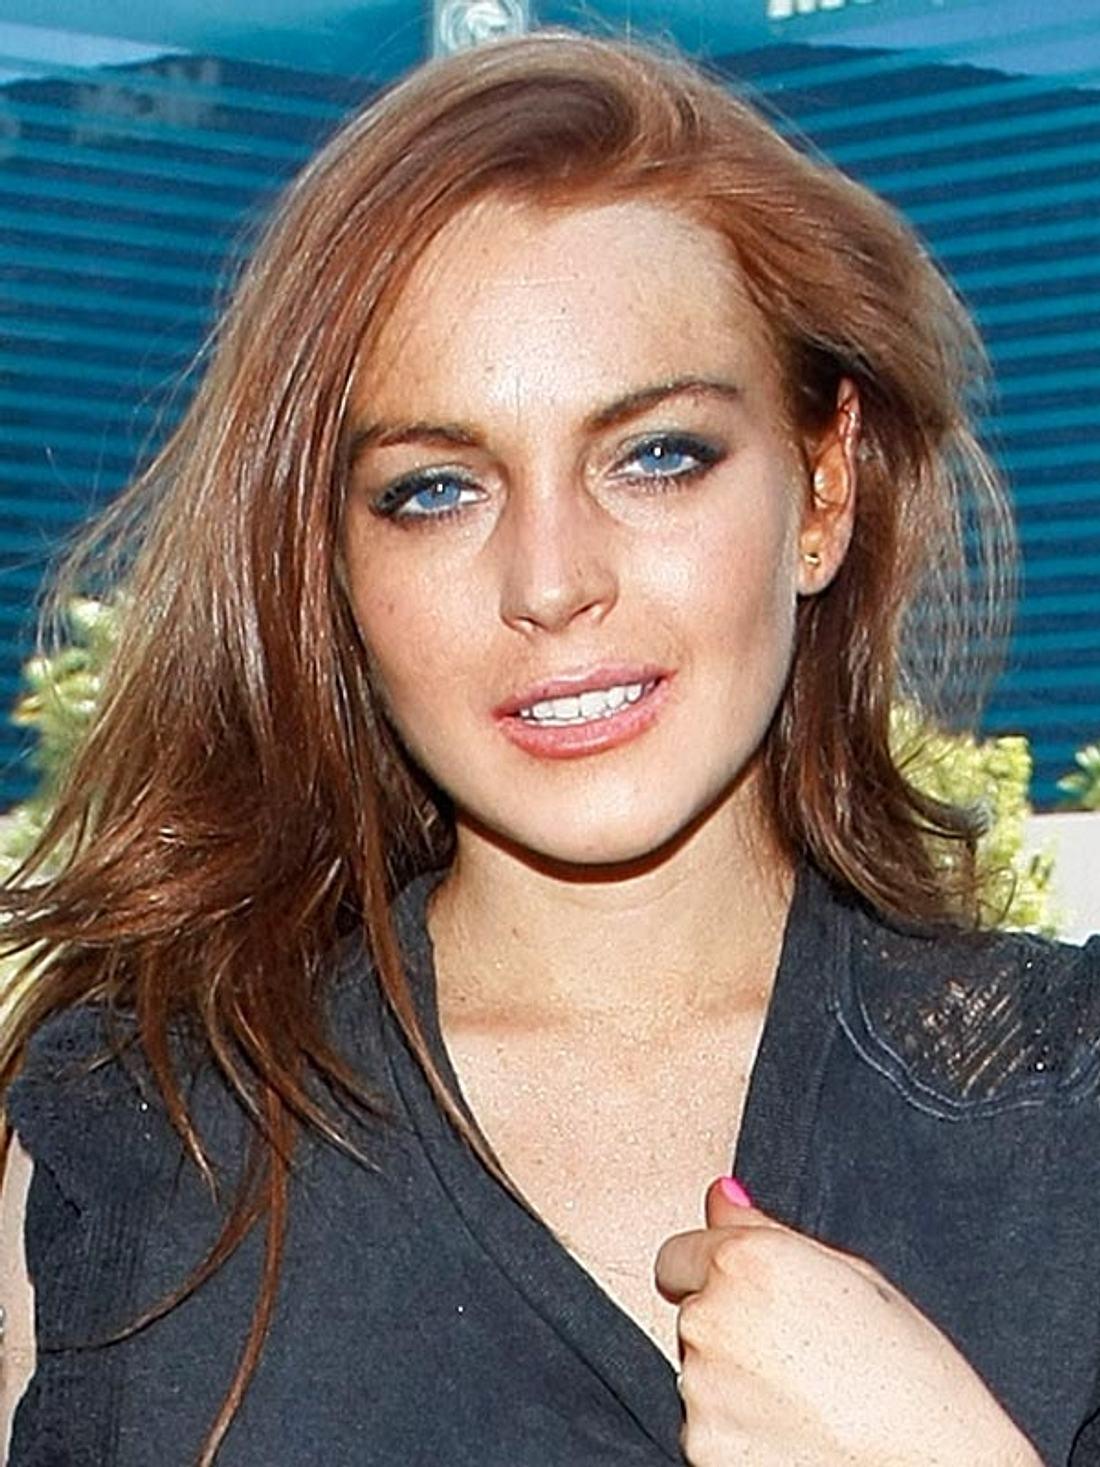 Ärger um Telefon: Als Lindsay Lohan ihr Telefon vermisste, war plötzlich Mega-Stress angesagt